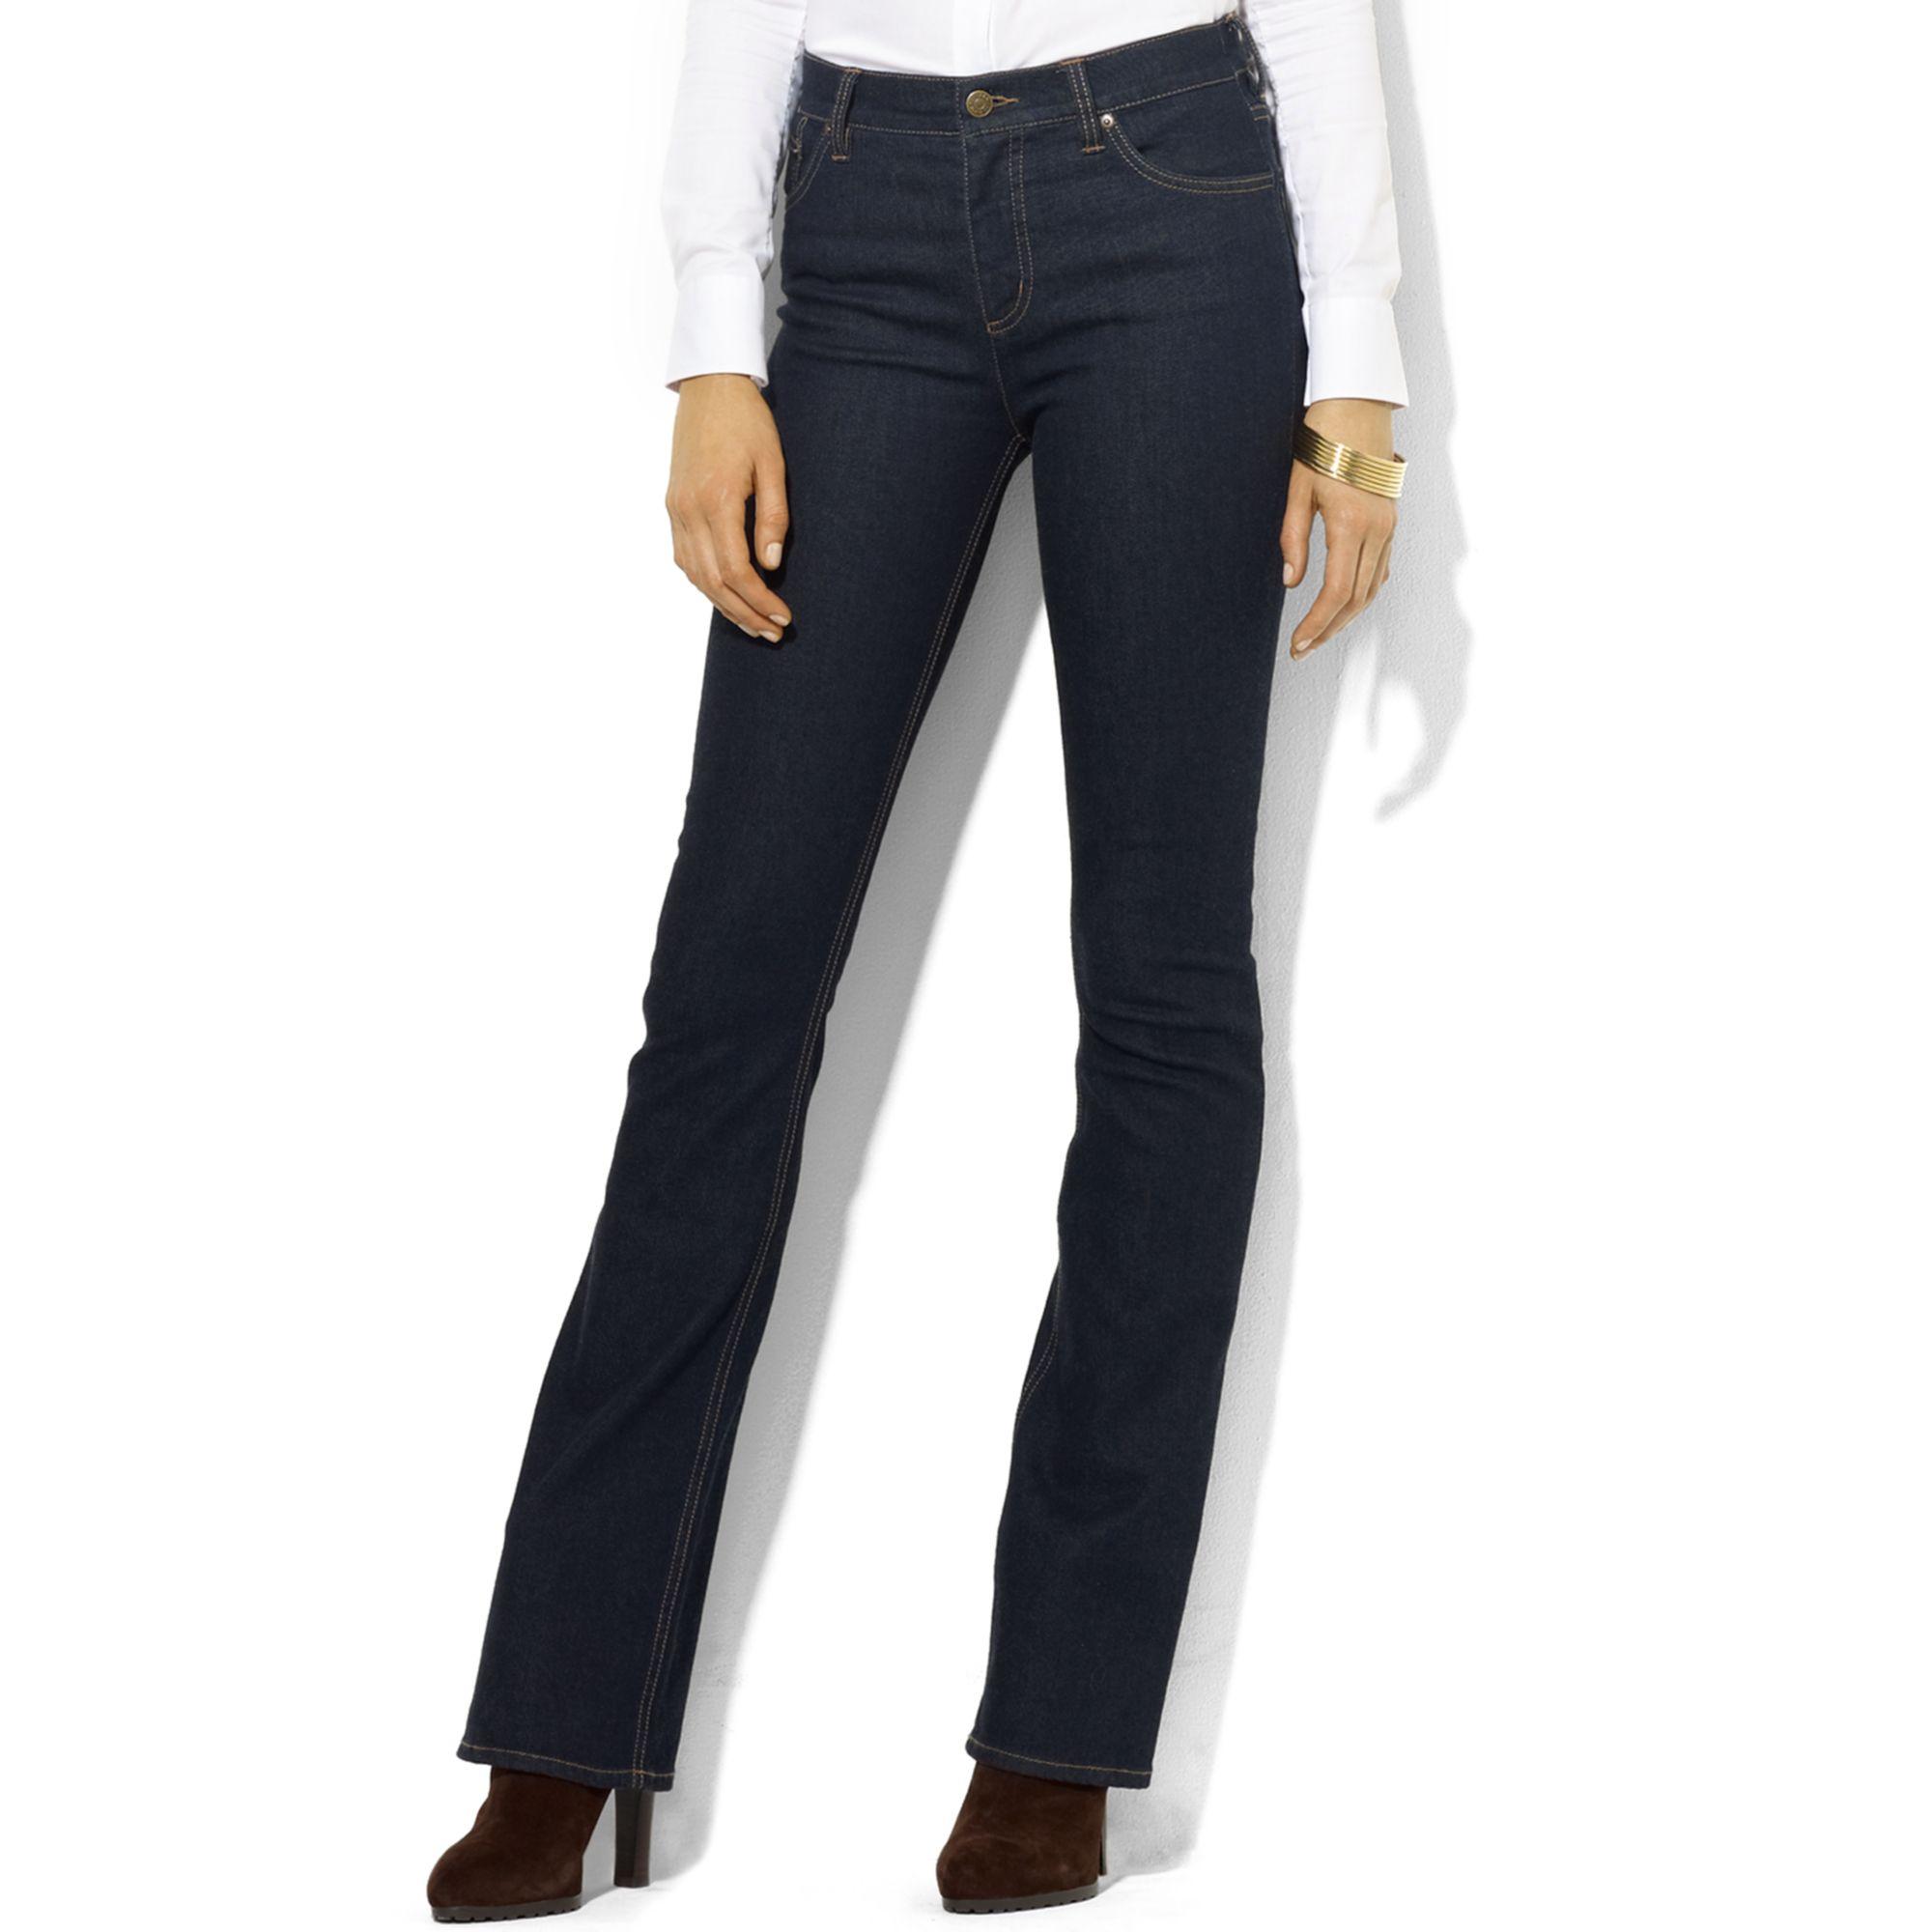 lauren by ralph lauren lauren jeans co stretch bootcut. Black Bedroom Furniture Sets. Home Design Ideas